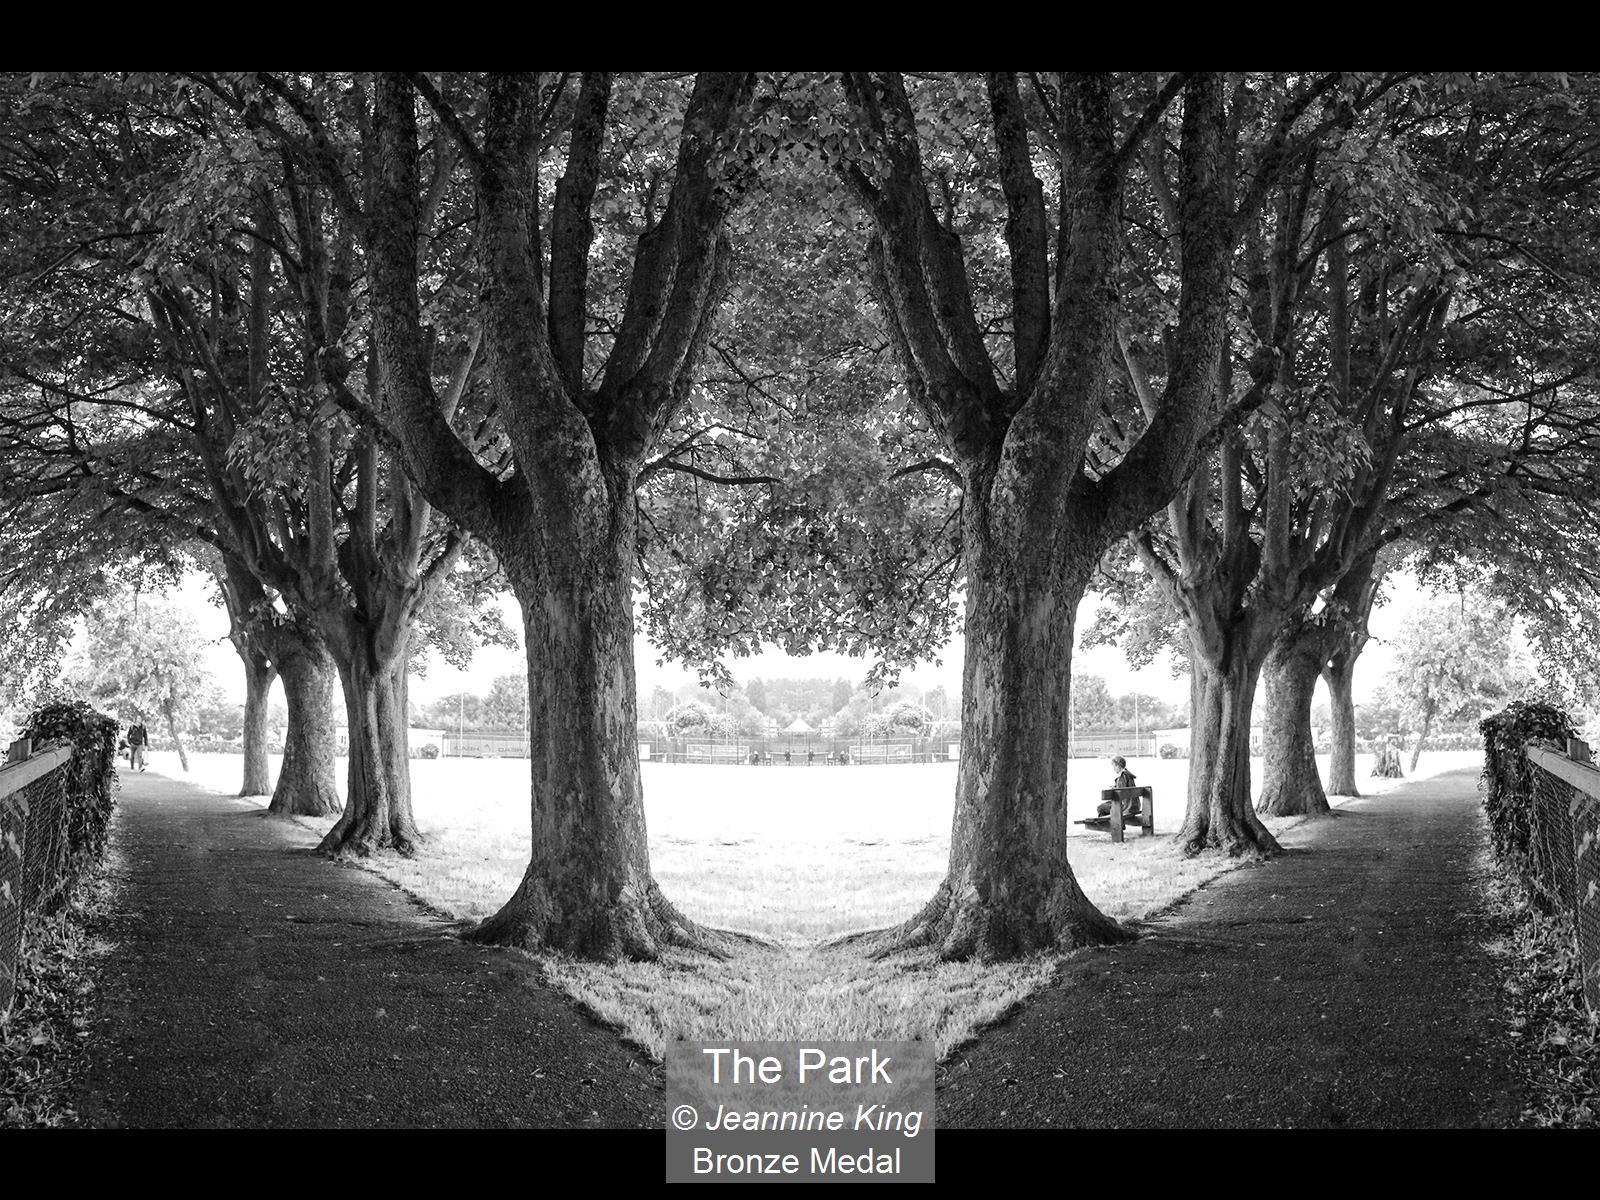 The Park_Jeannine King_Bronze